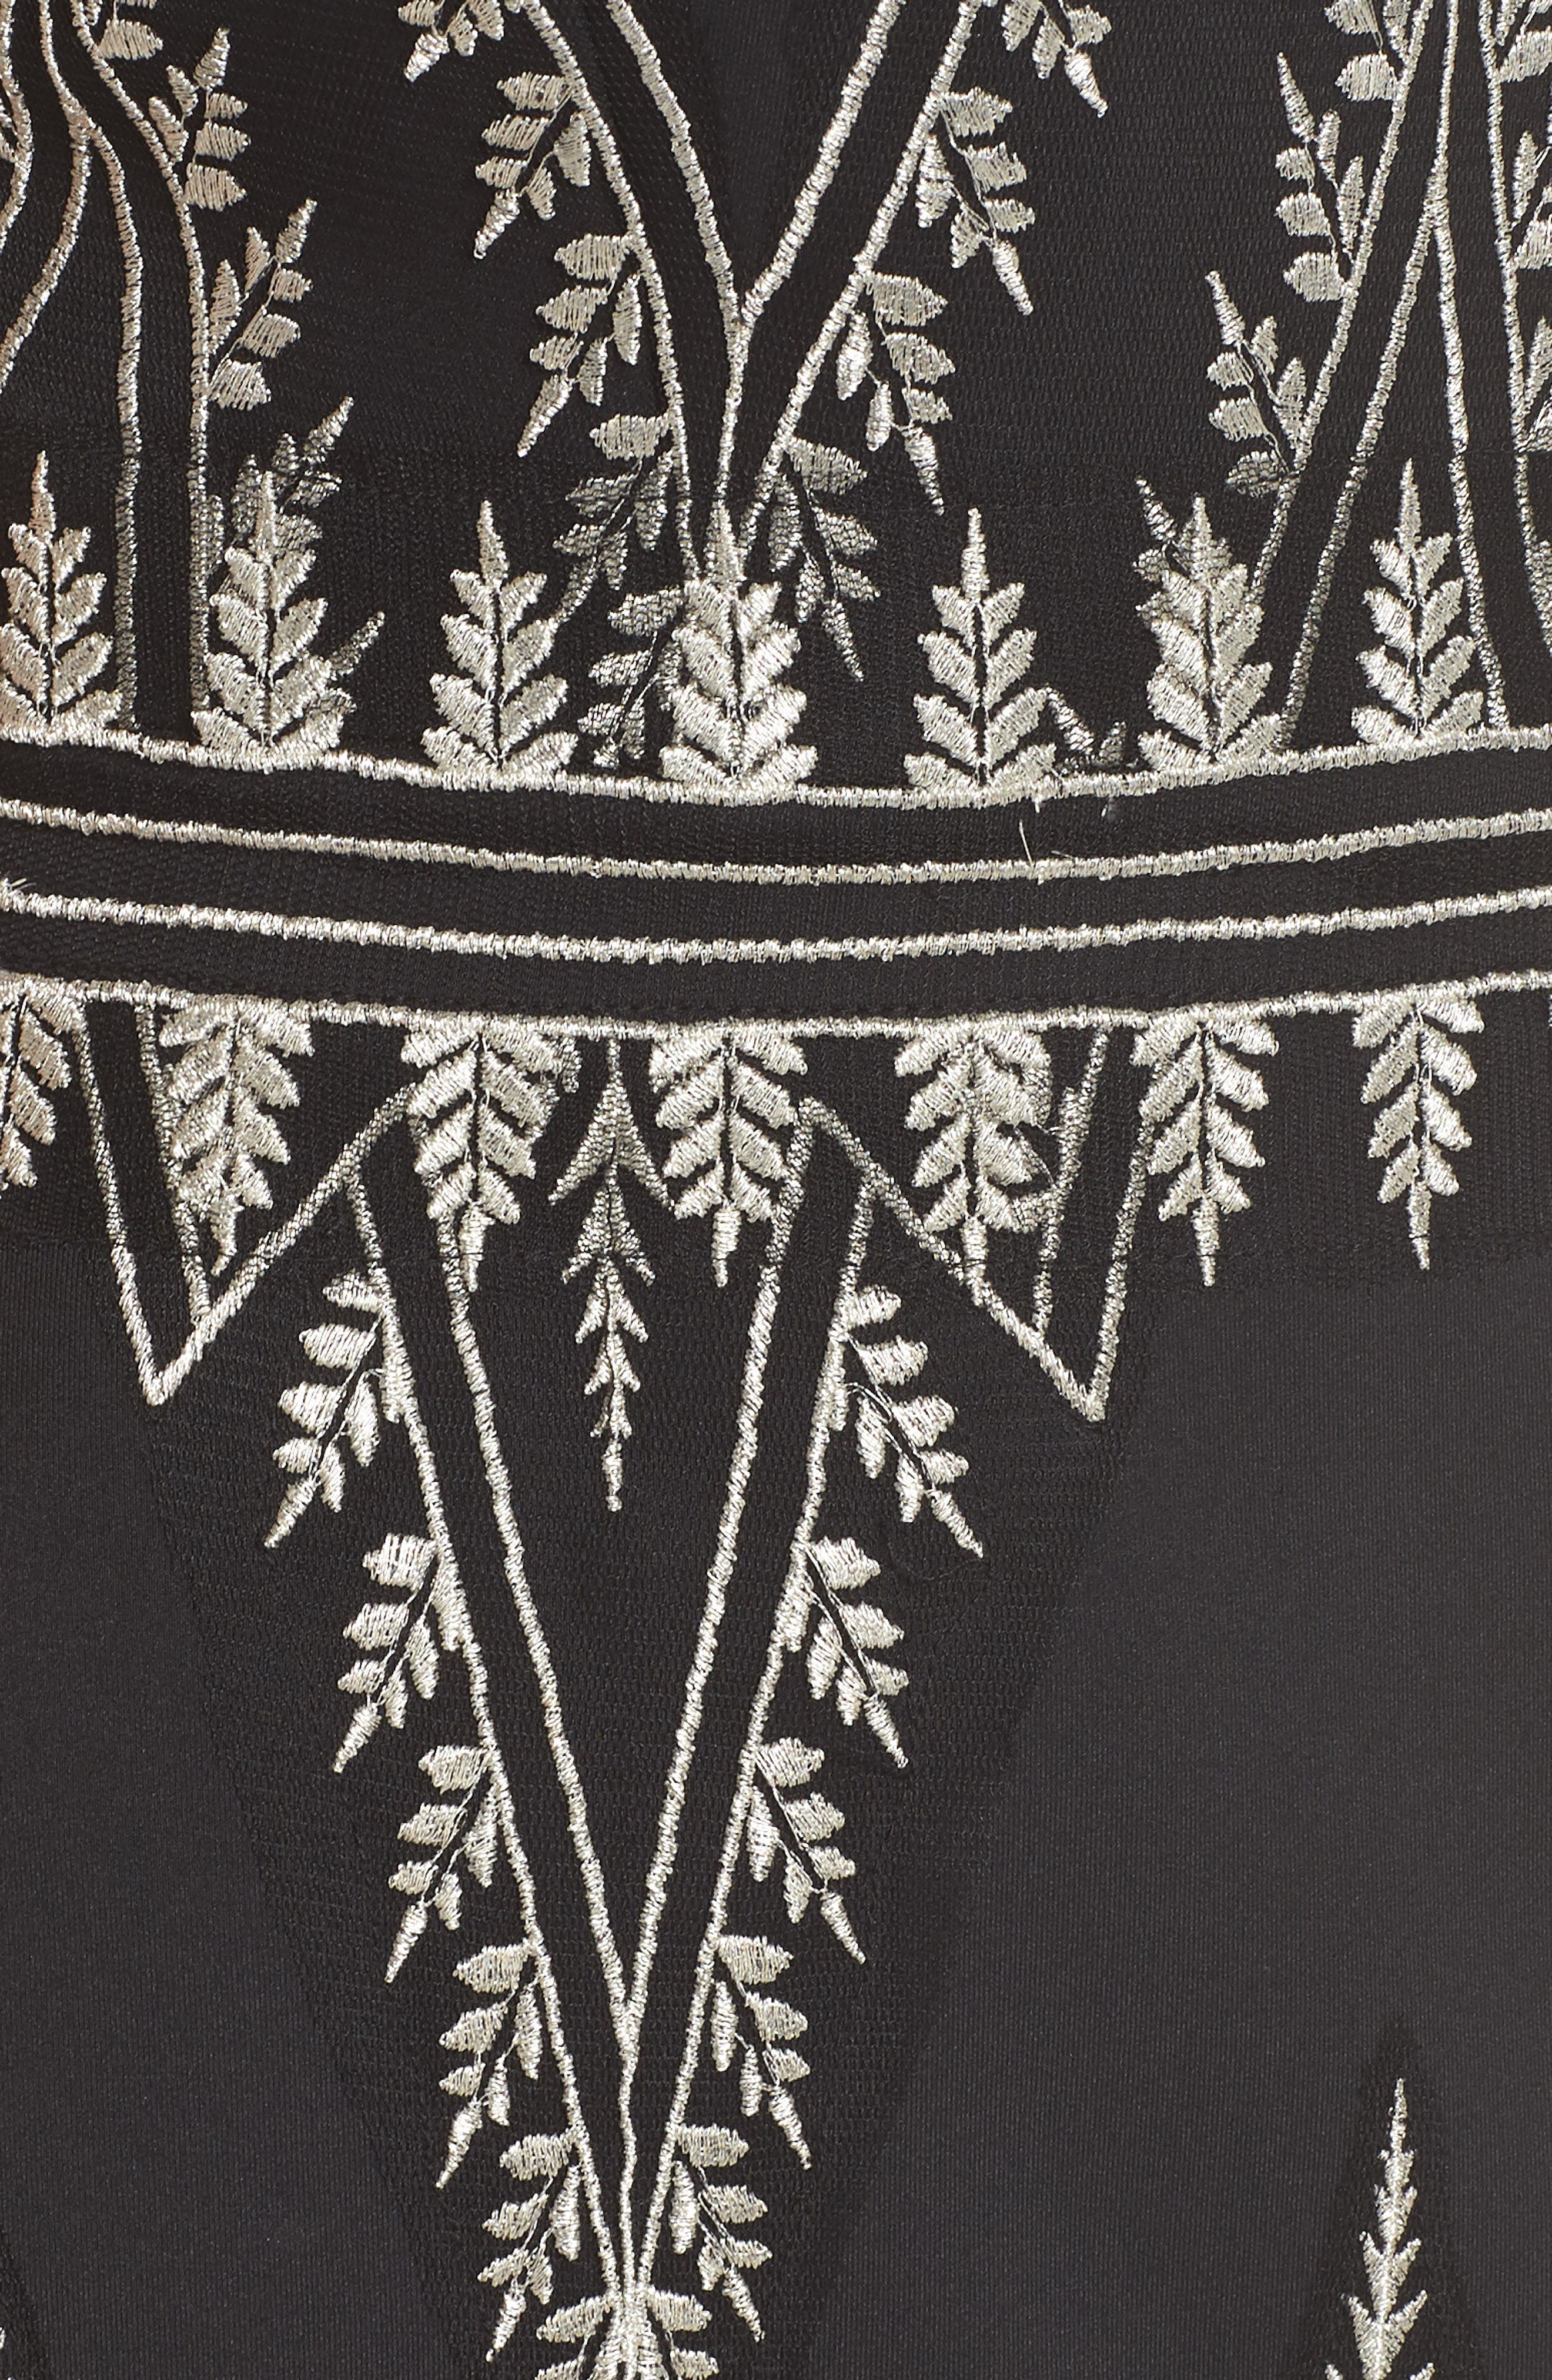 Embroidered Chevron Dress,                             Alternate thumbnail 5, color,                             Black/ Silver